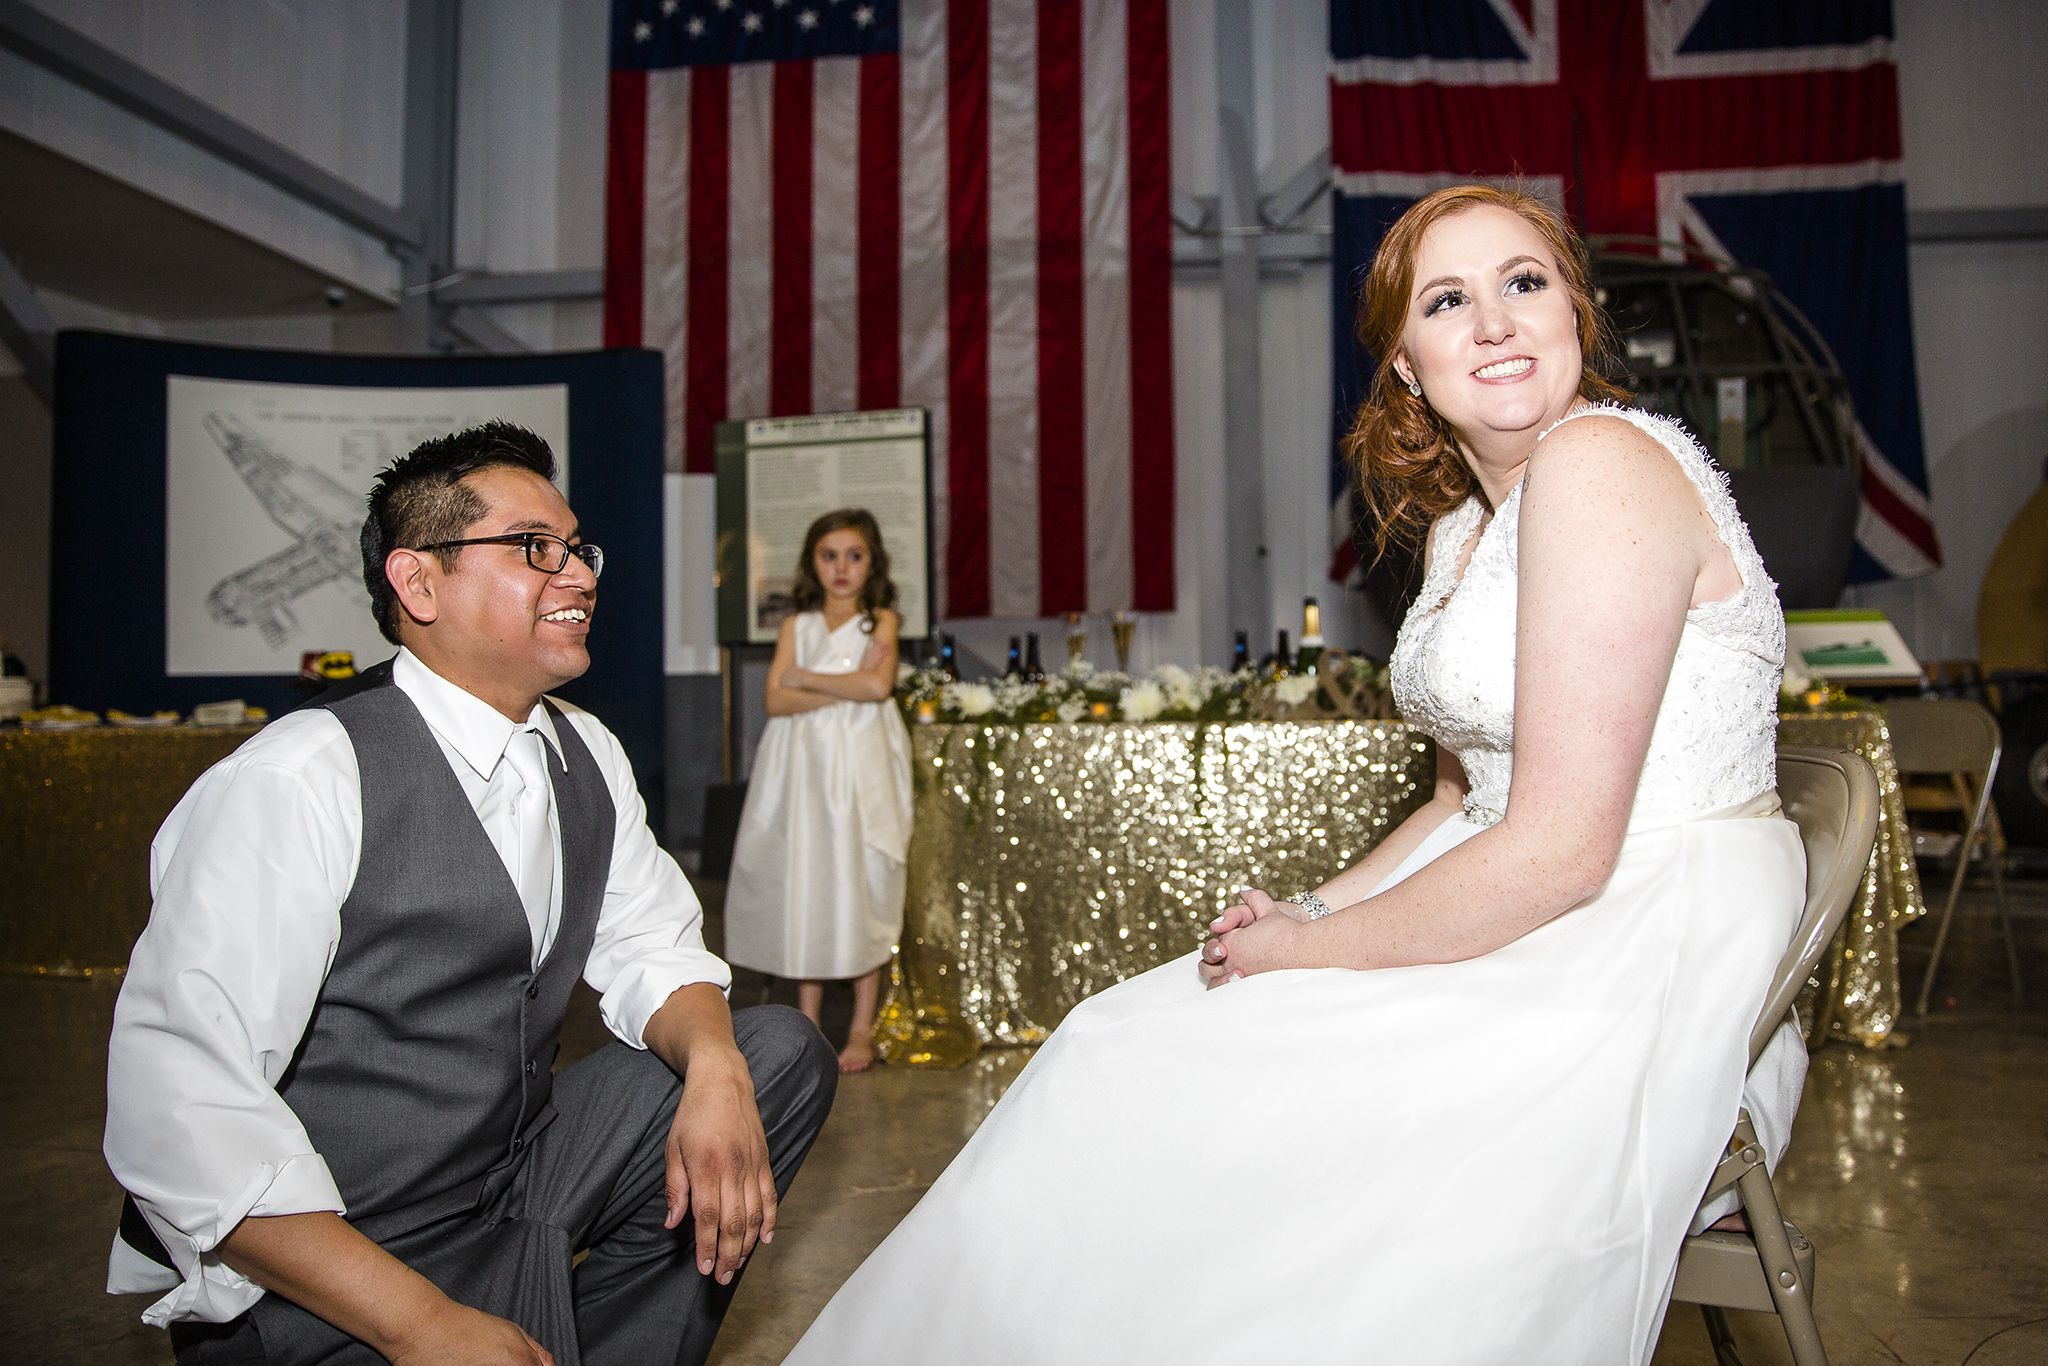 garter toss, wedding reception, wedding tradition, fun wedding reception